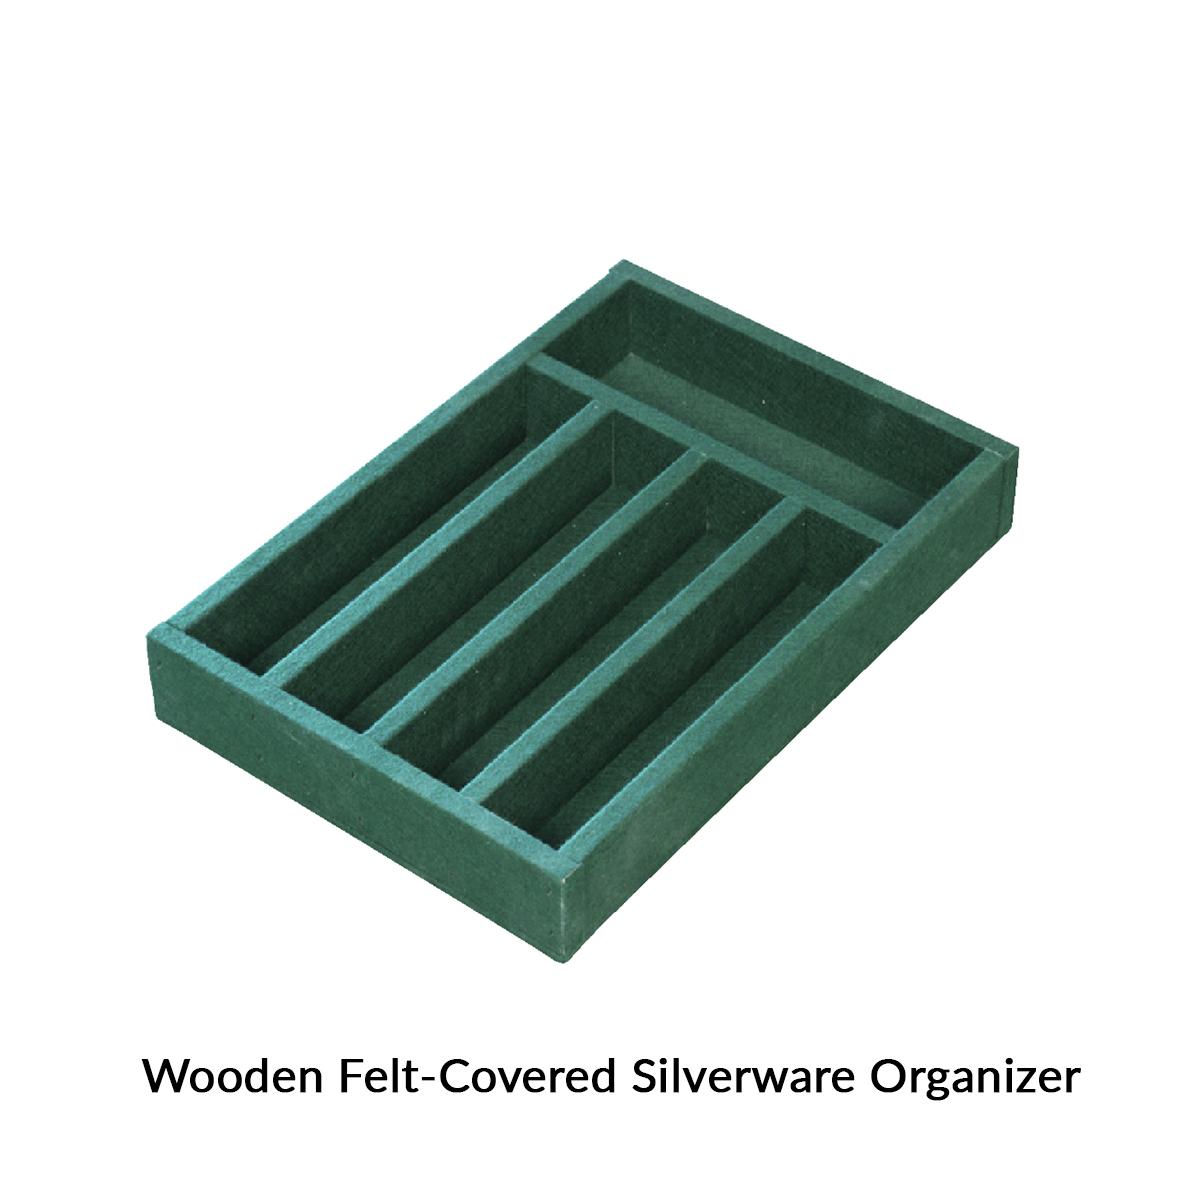 tf-wooden-felt-covered-silverware-organizer.jpg